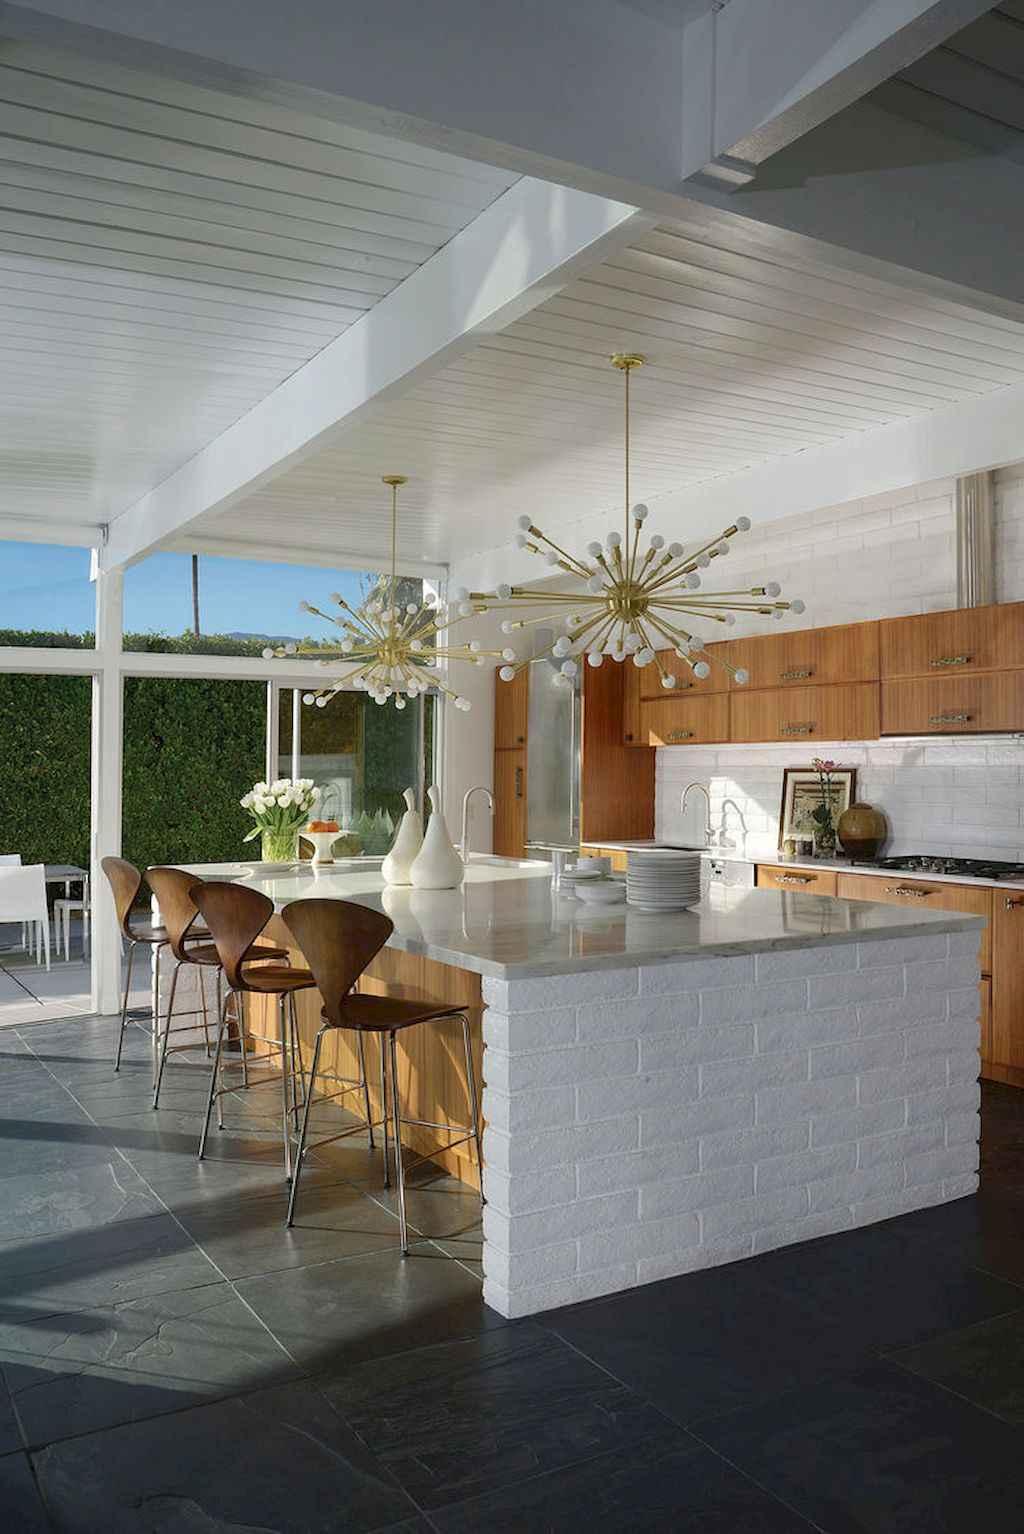 Mid century modern kitchen design ideas (29)